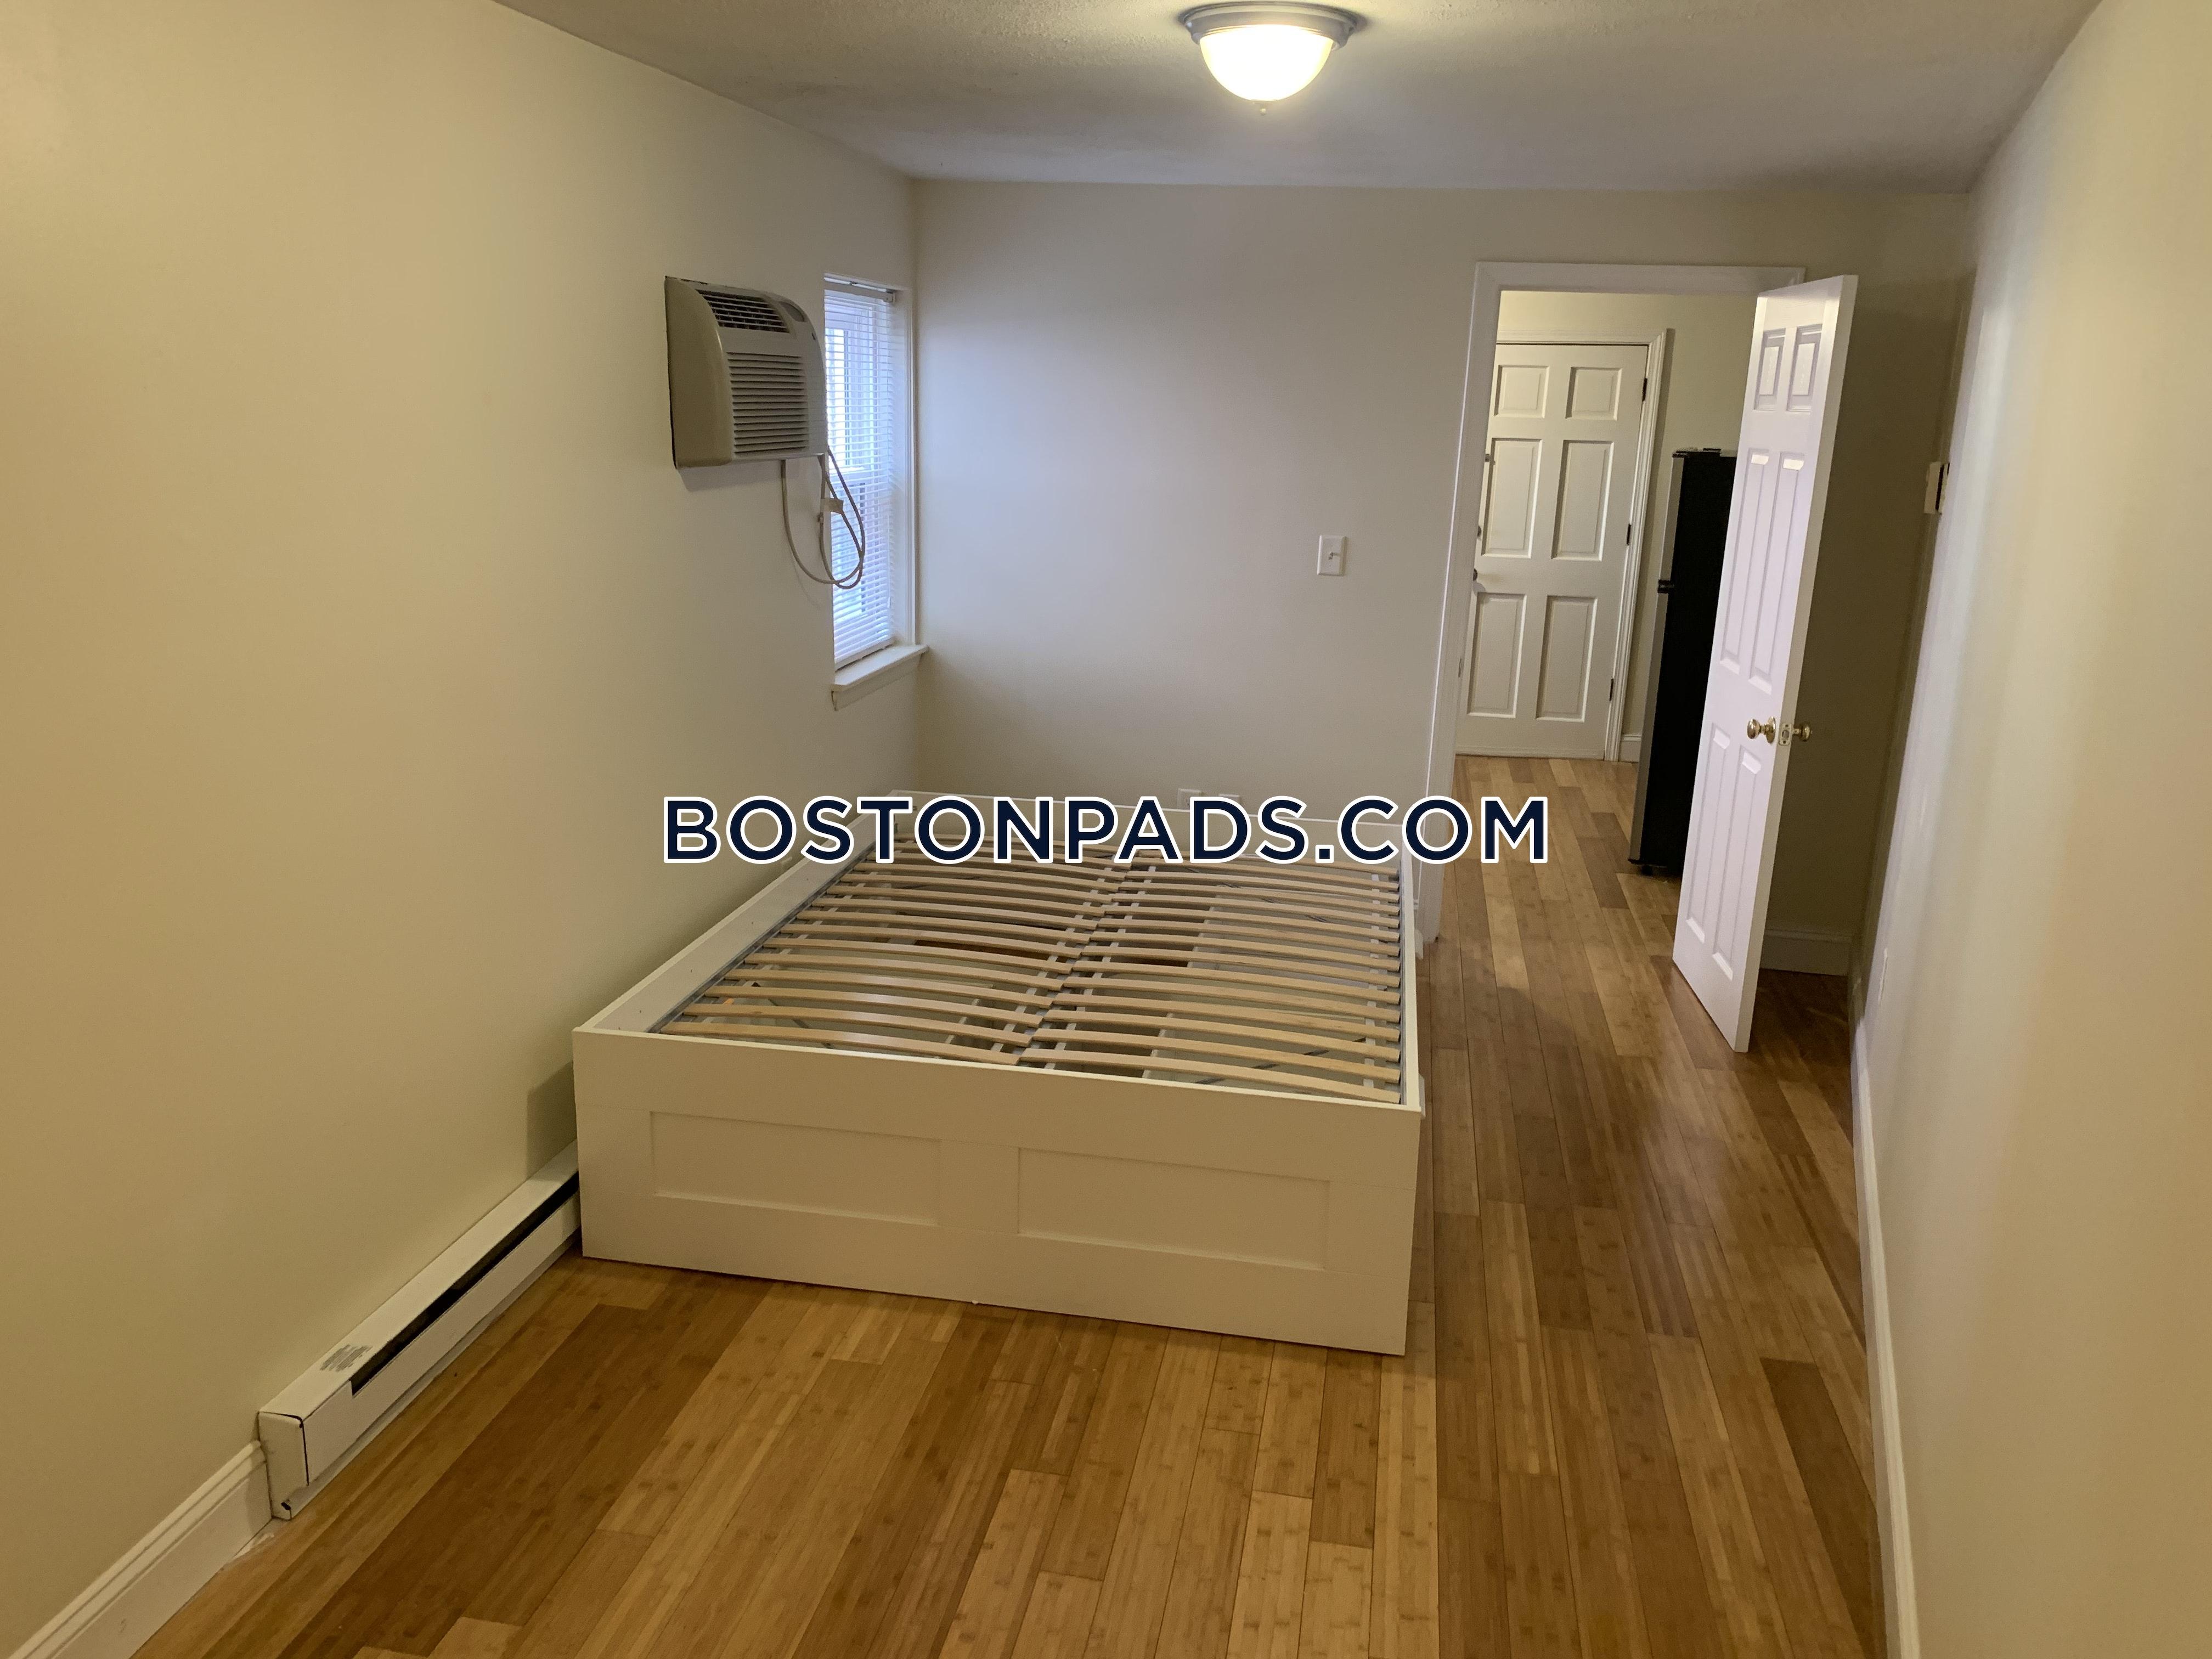 Bartlett Place Boston